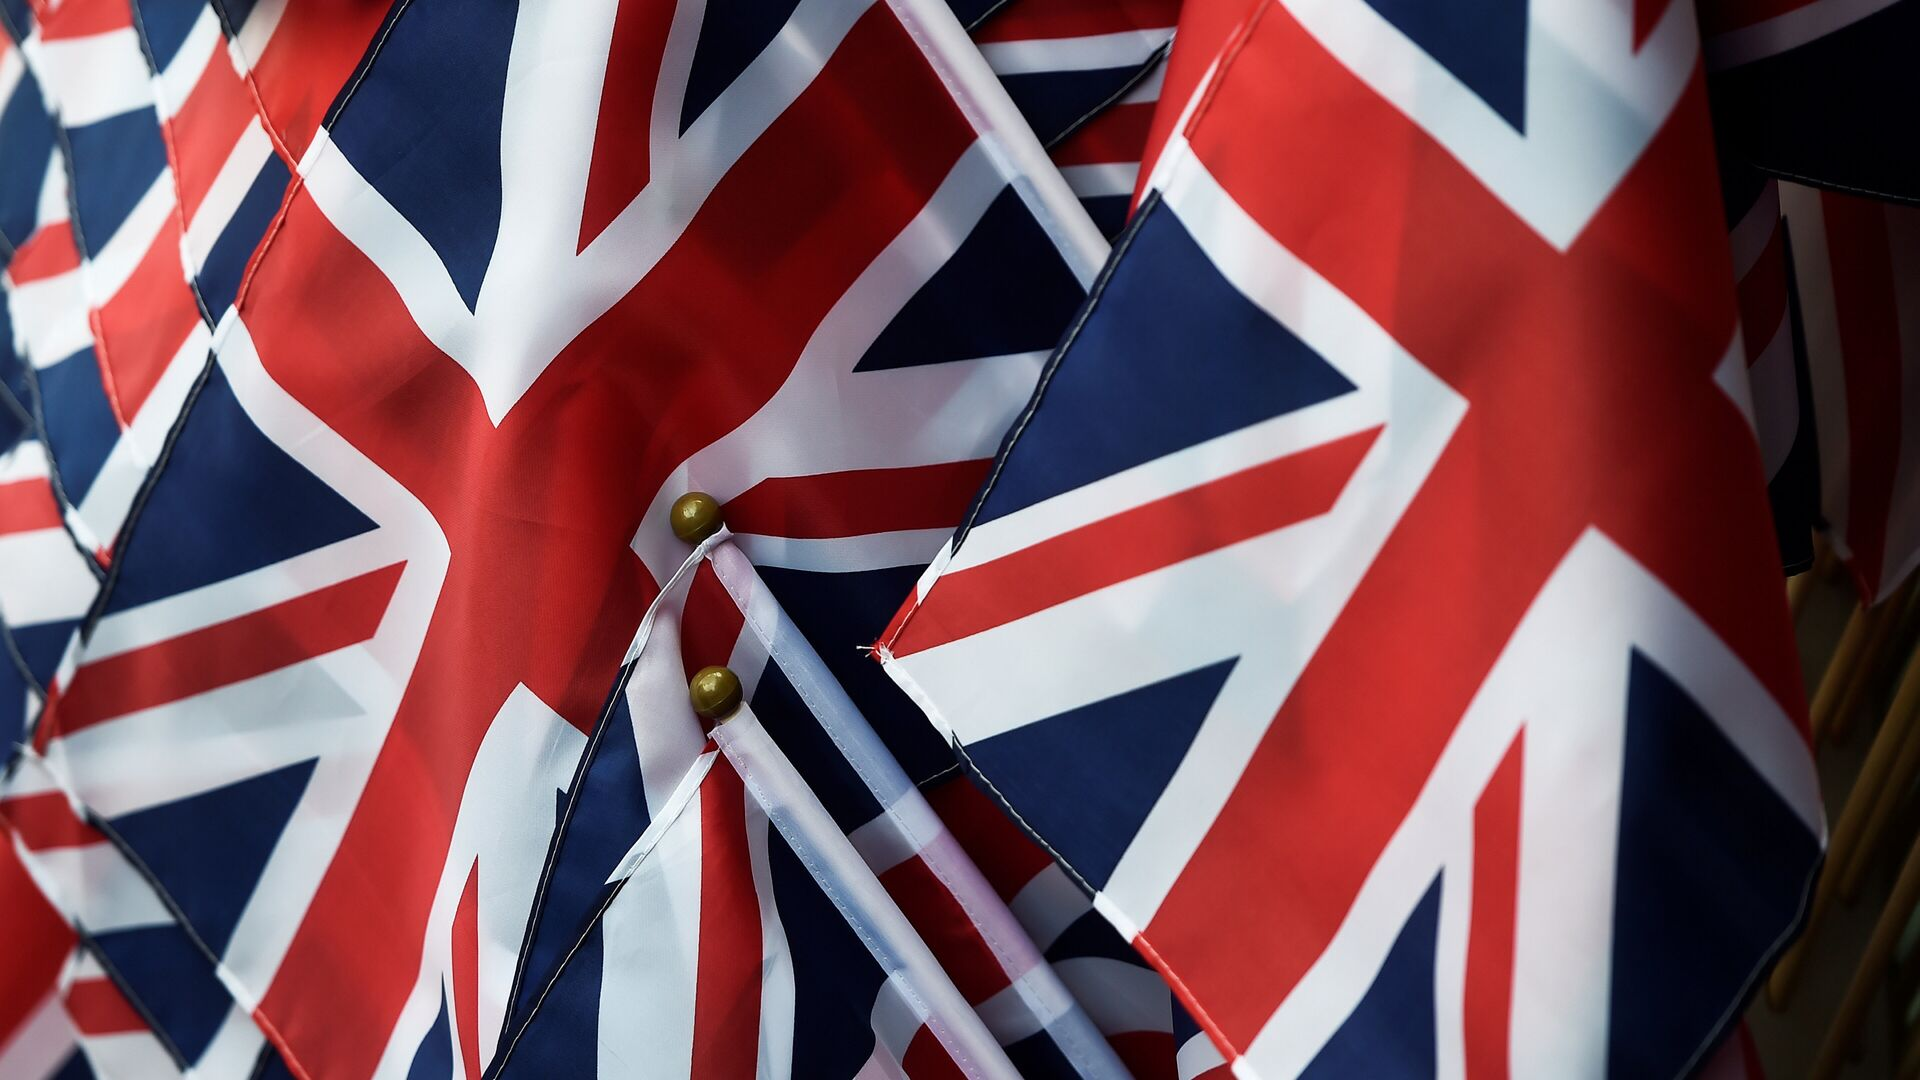 Las banderas del Reino Unido - Sputnik Mundo, 1920, 20.08.2021